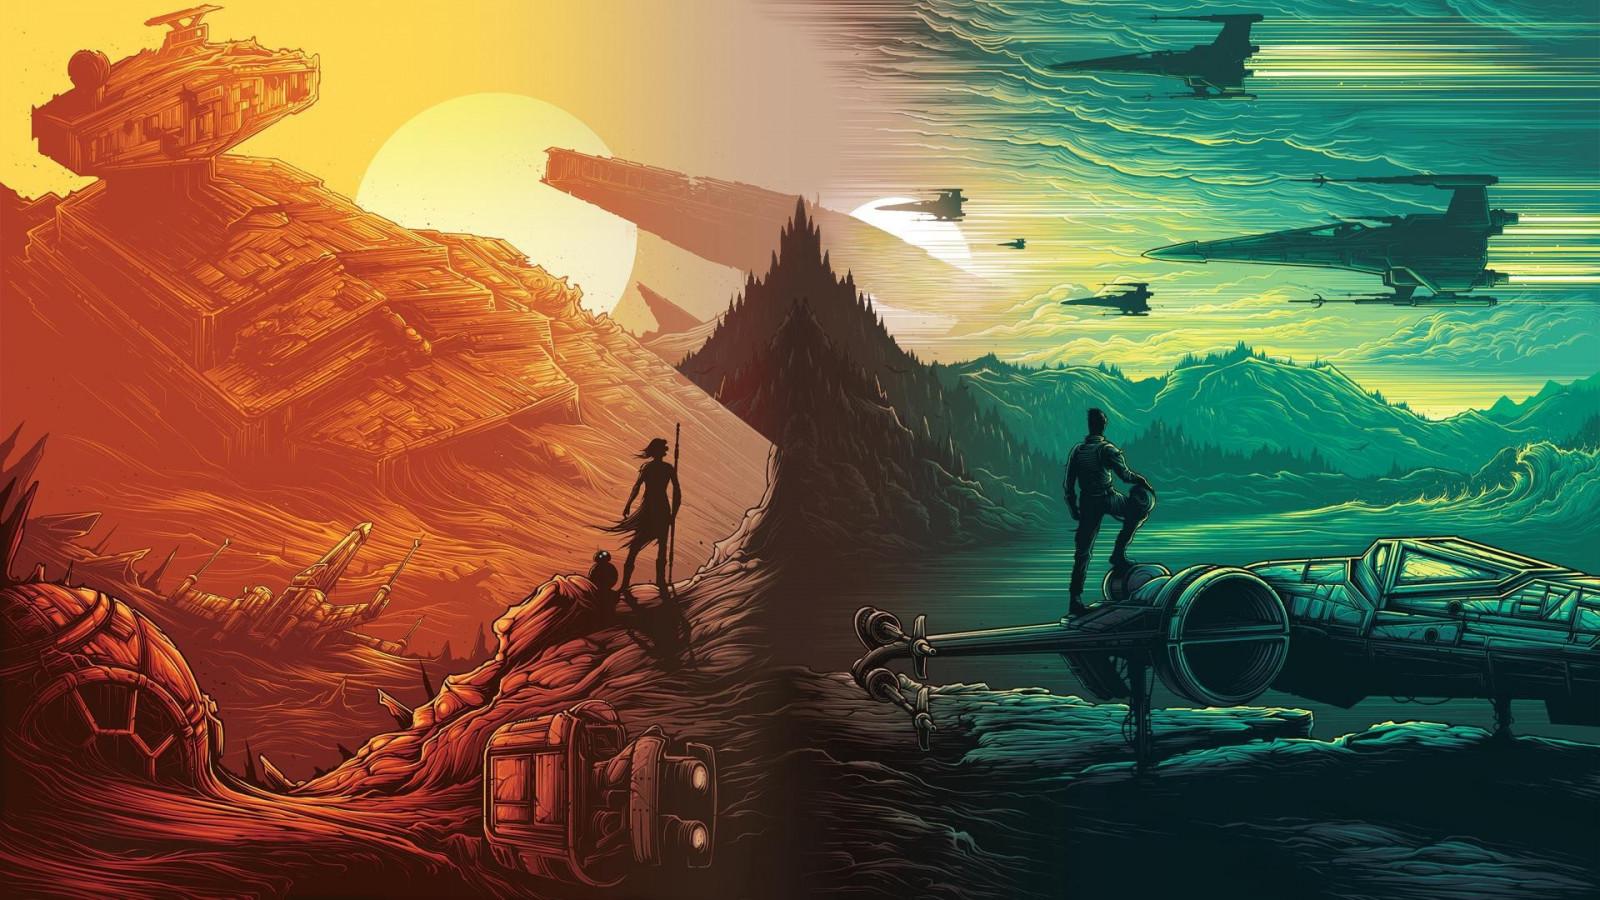 Daisy Ridley Star Wars Wallpaper: Wallpaper : Illustration, Star Wars, Star Destroyer, X